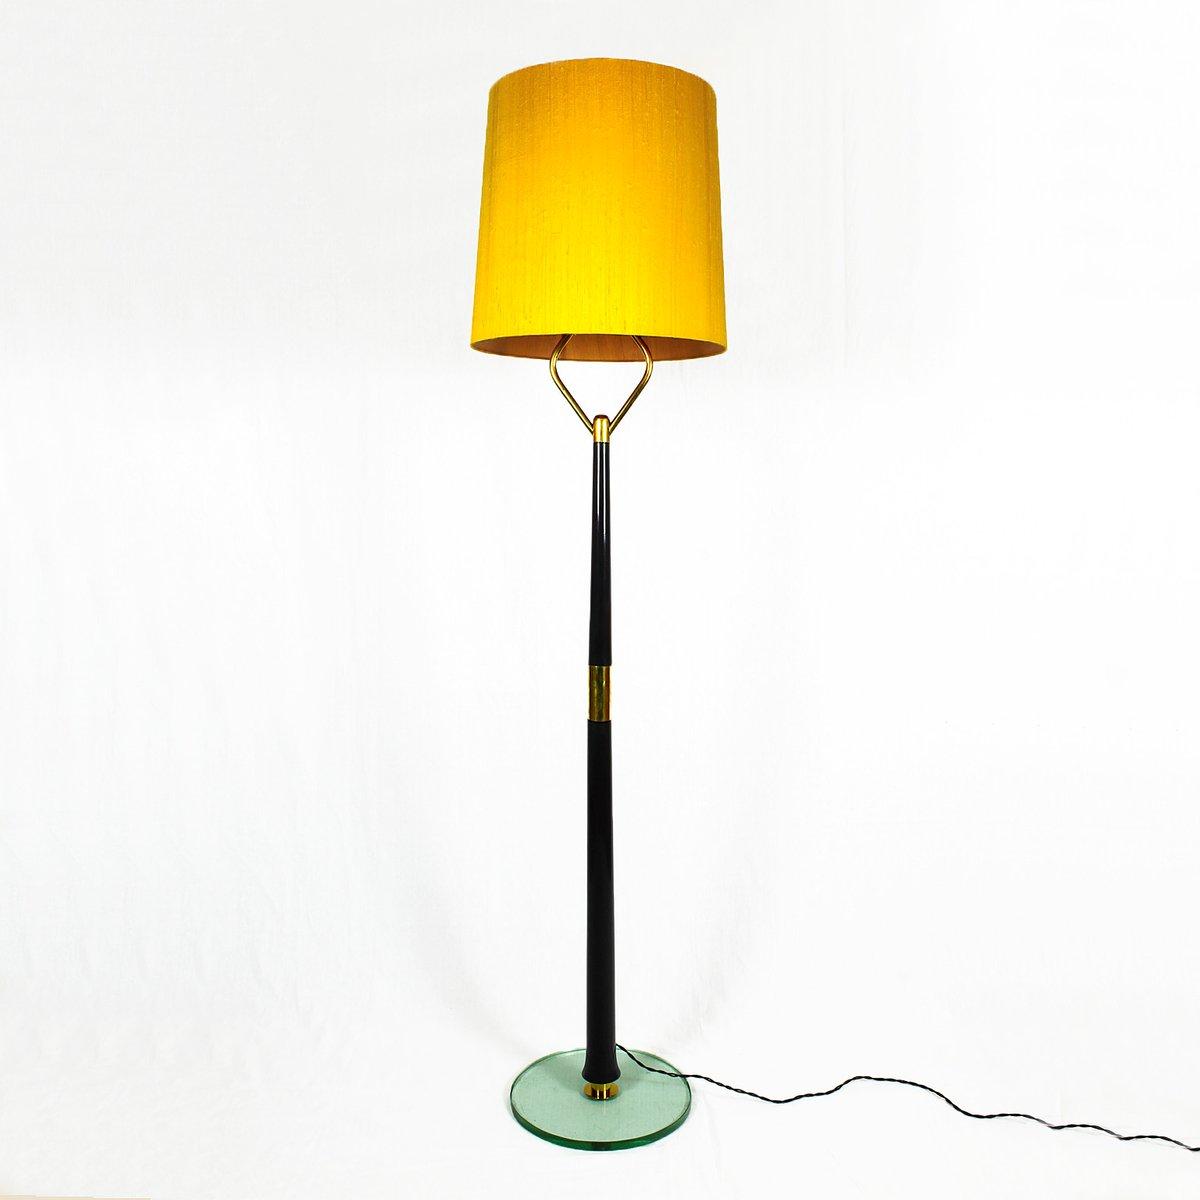 Italienische Mahagoni Stehlampe, 1940er